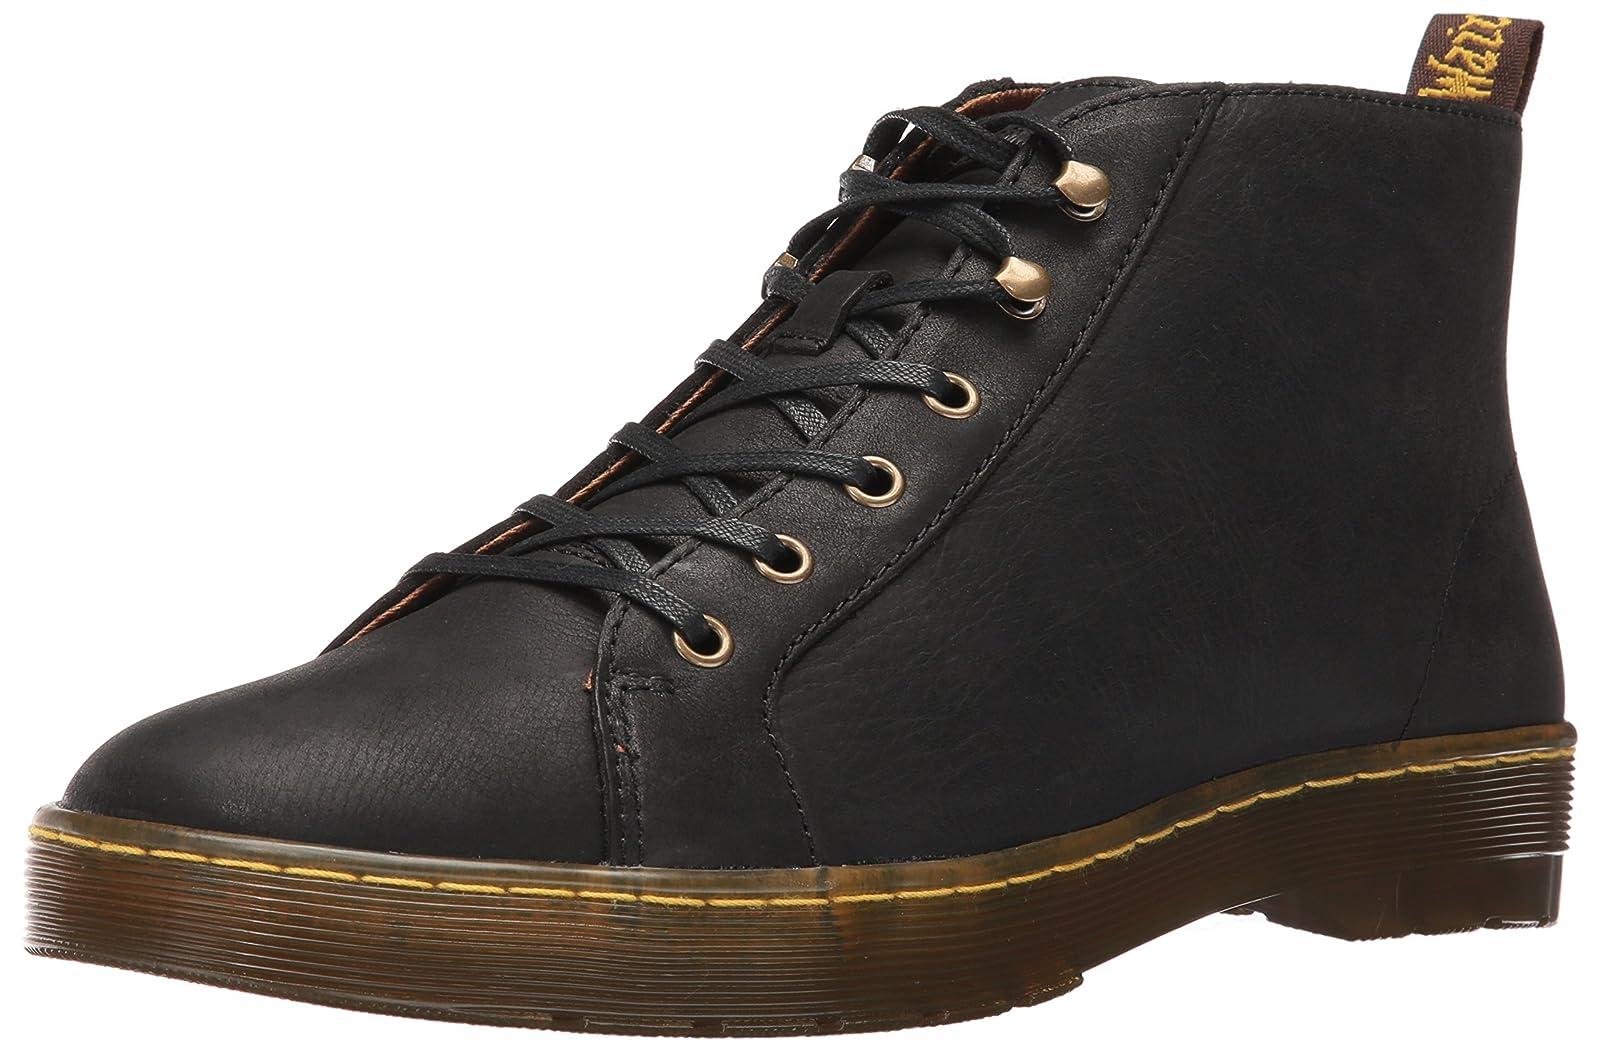 Dr. Martens Men's Coburg Wyoming Chukka Boot 9 M US - 1